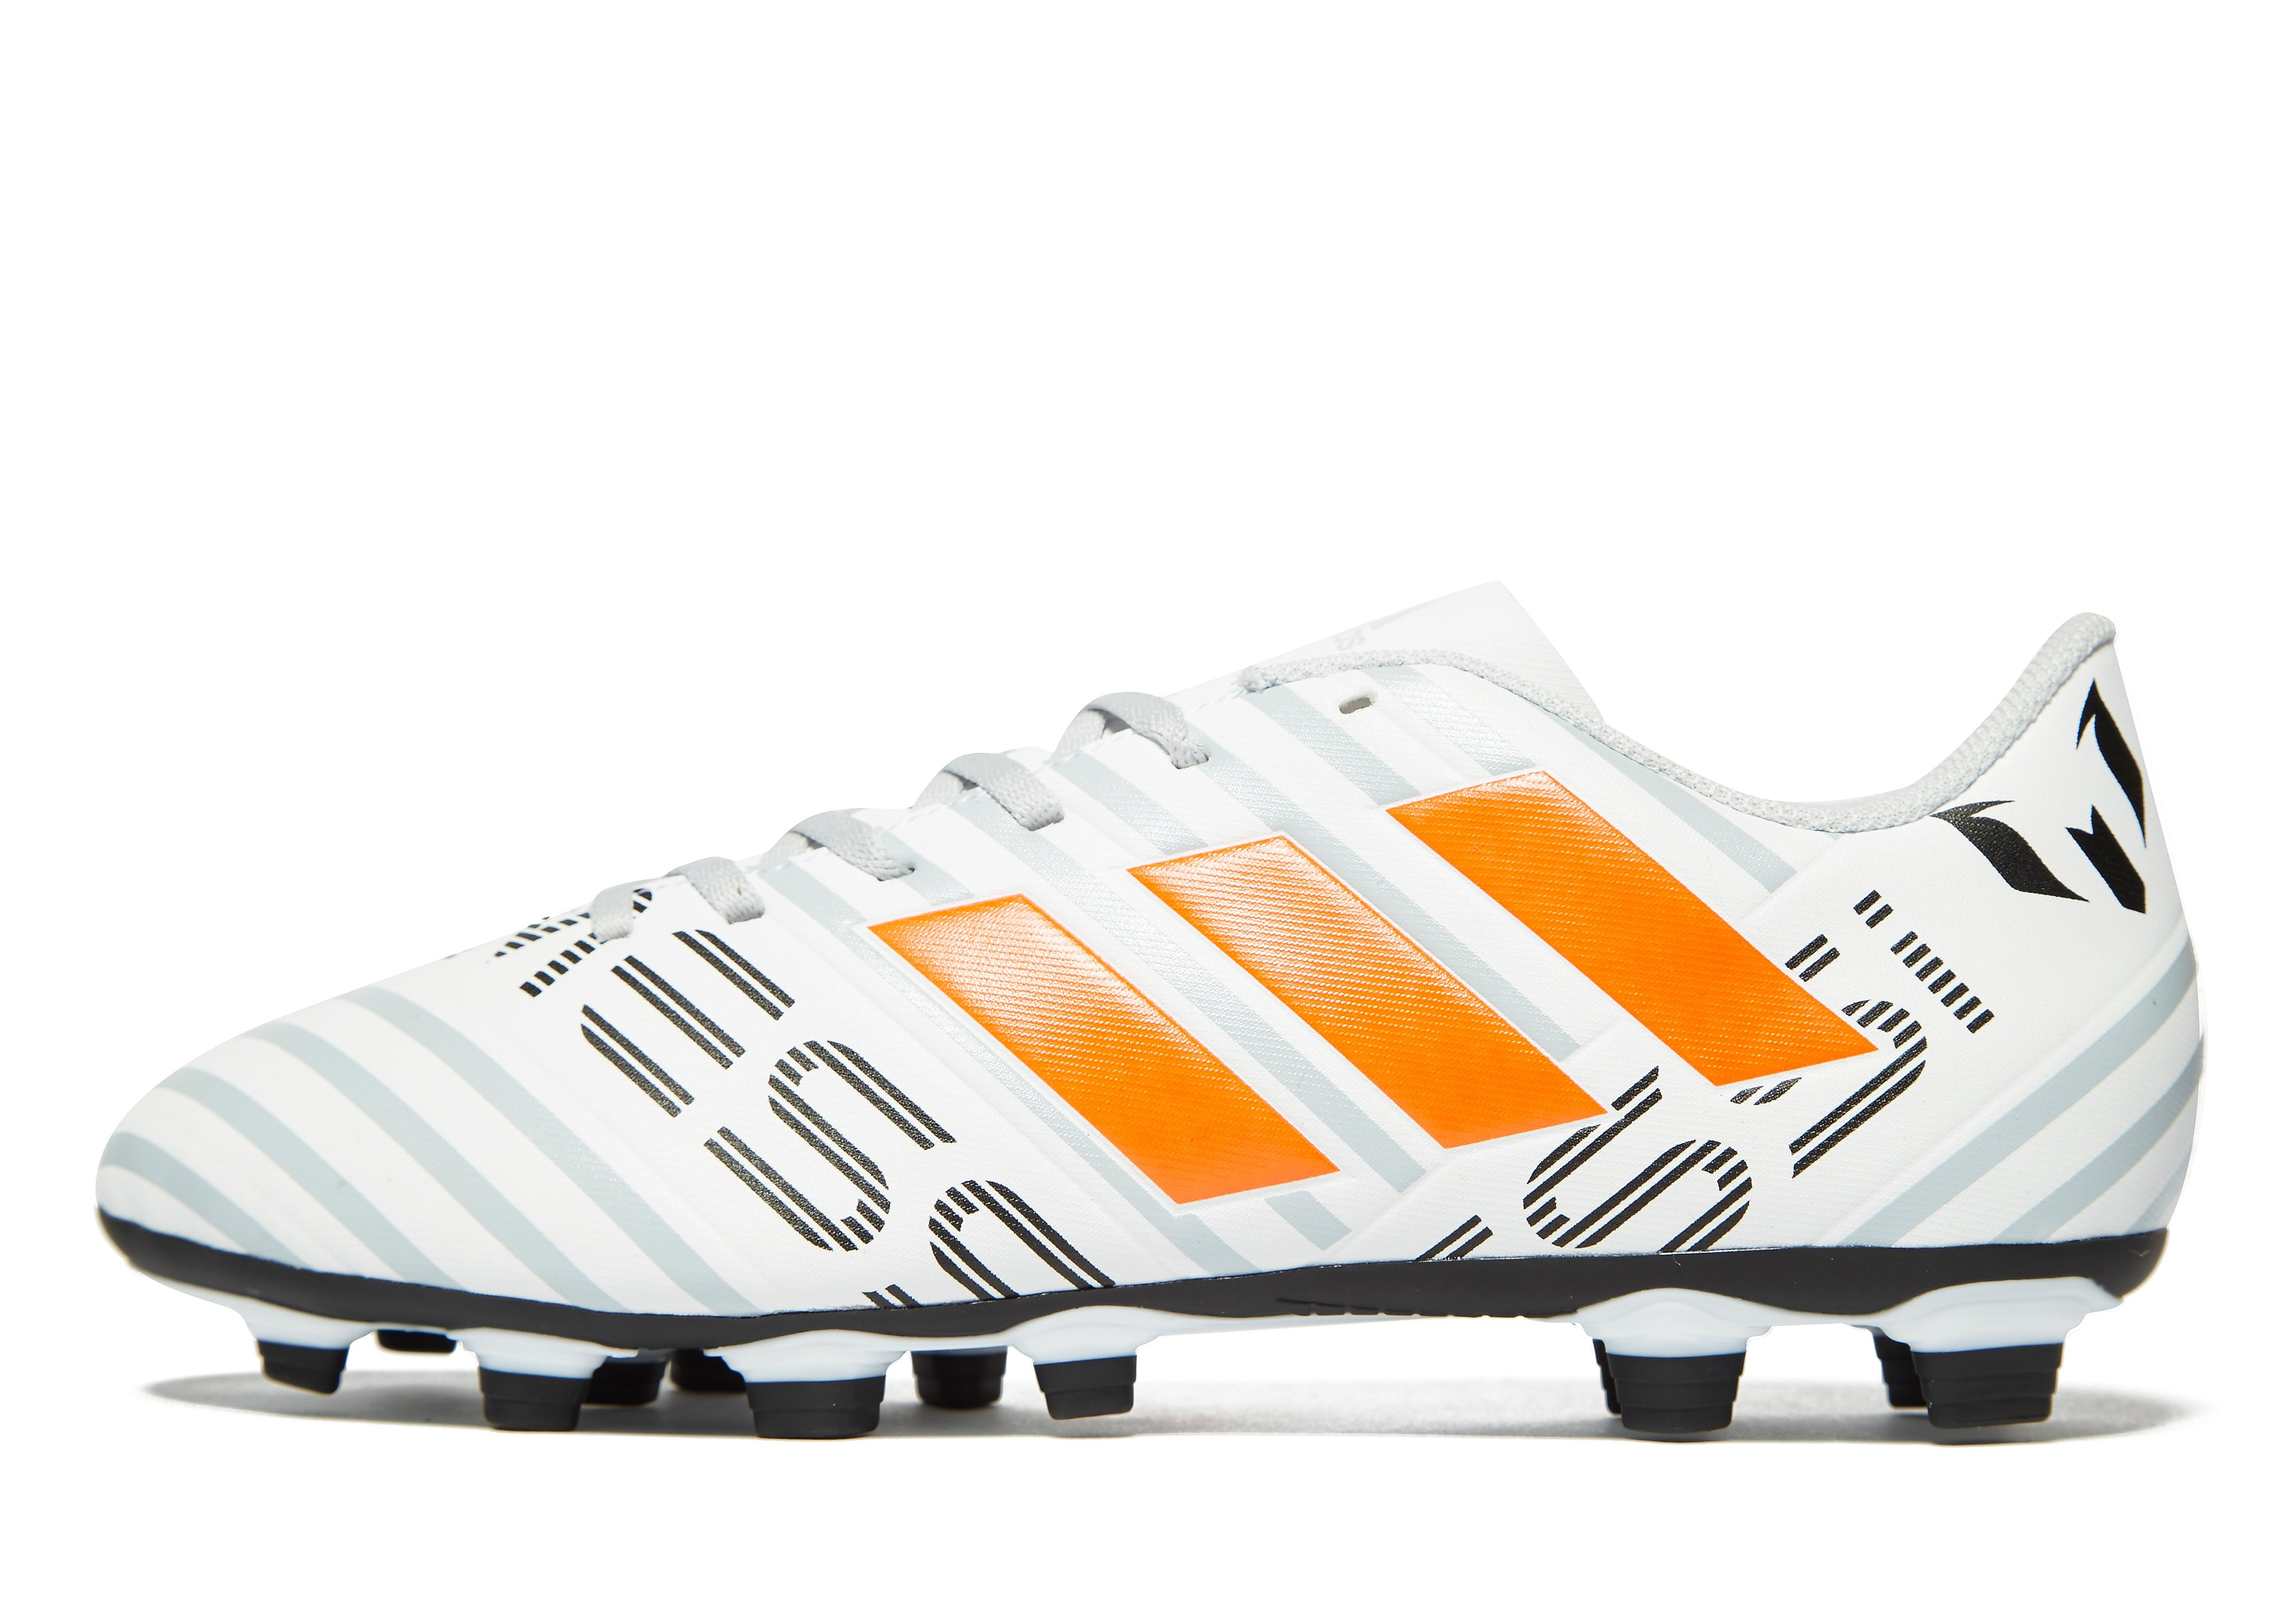 adidas Pyro Sturm Nemeziz Messi 17.4 FG